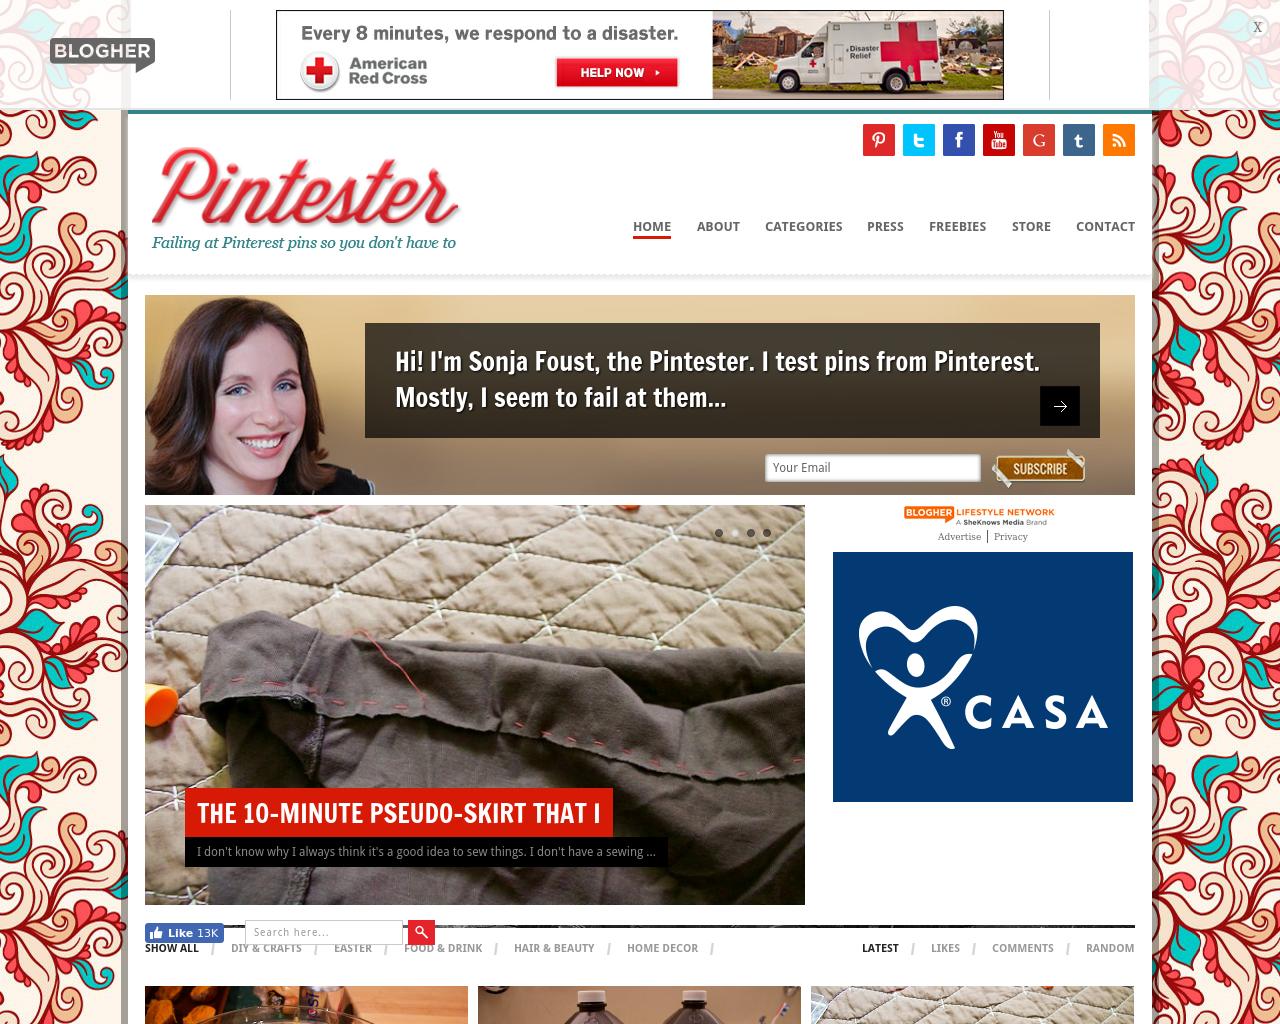 Pintester-Advertising-Reviews-Pricing